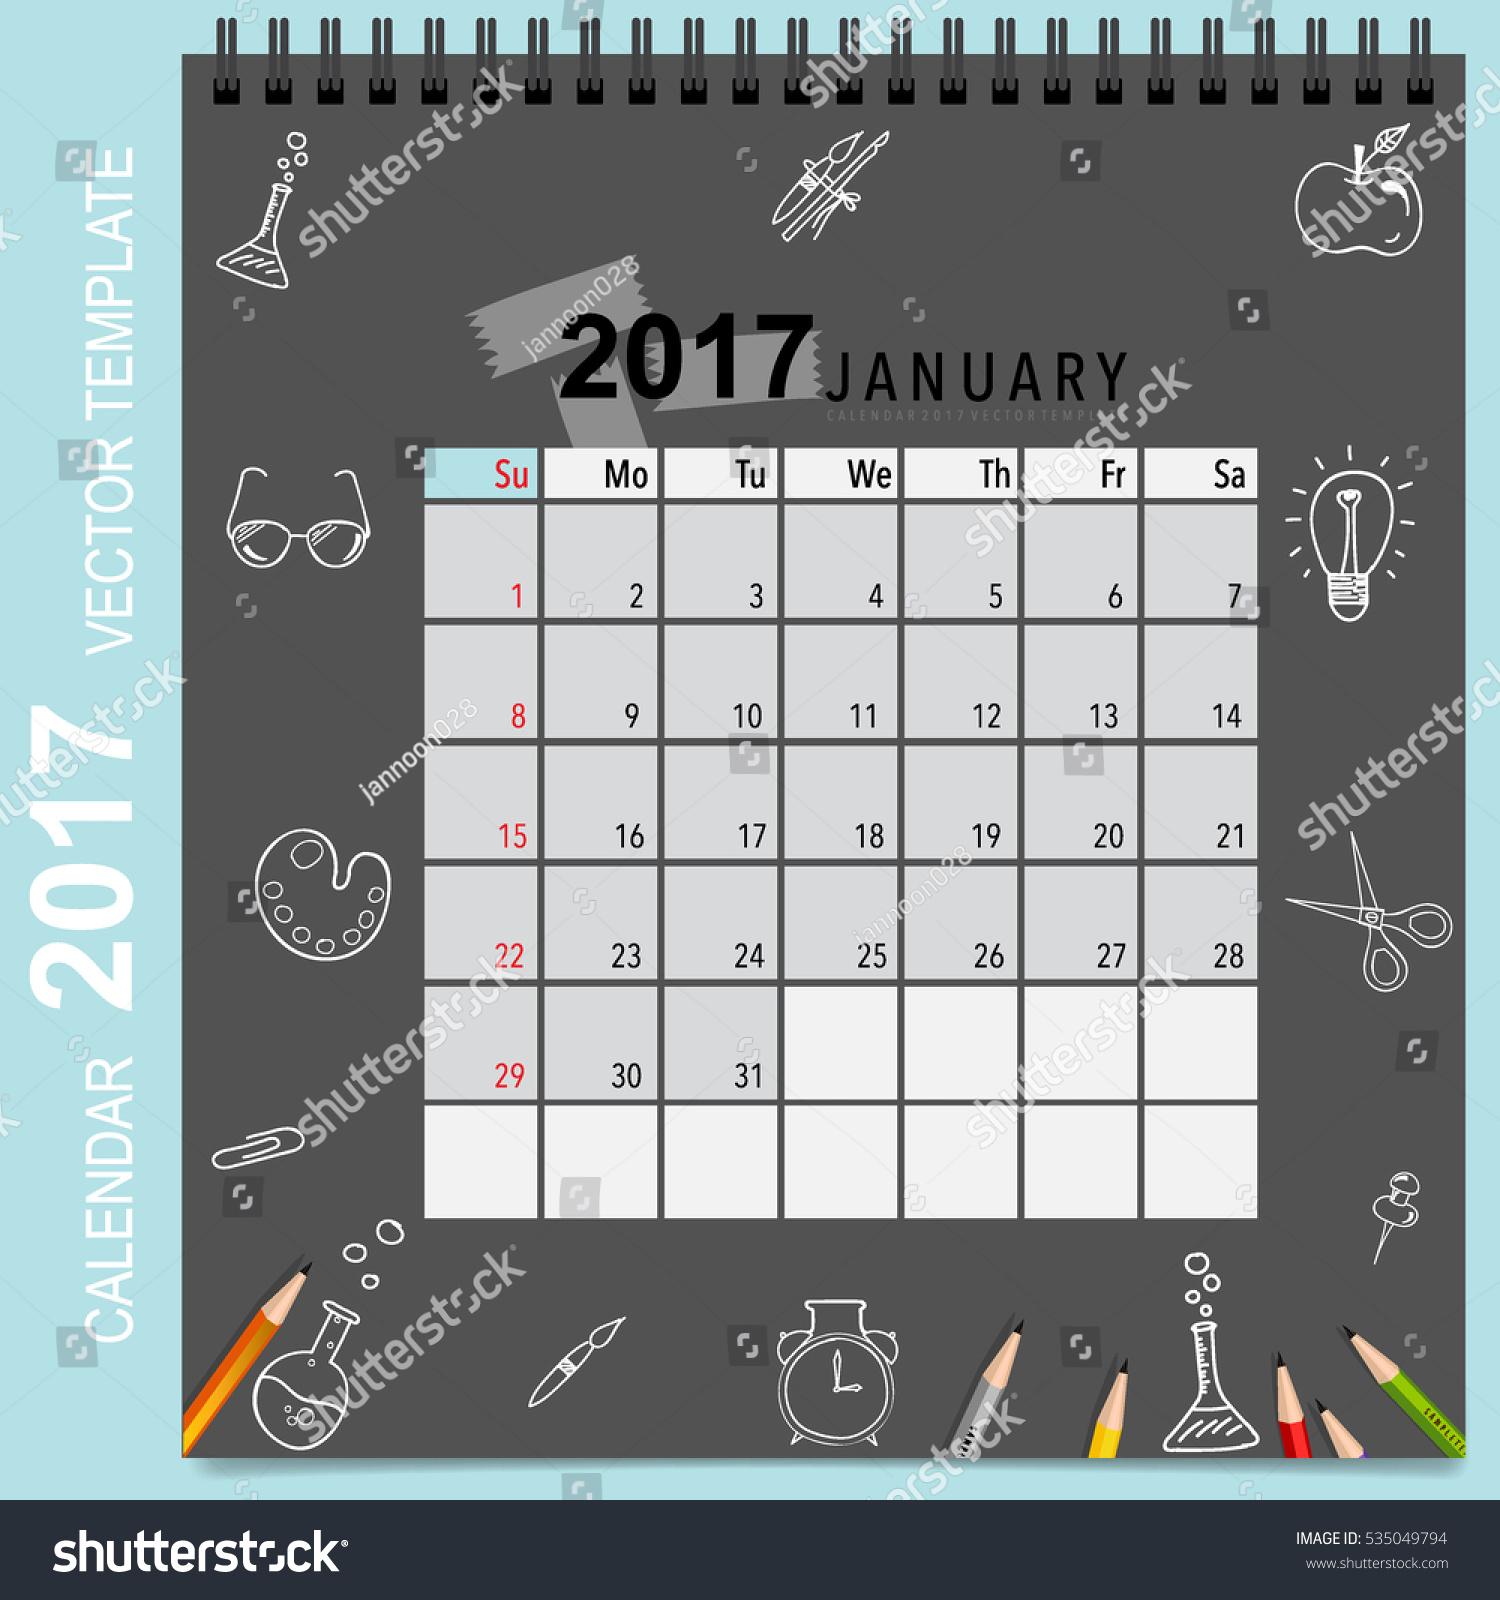 Monthly Calendar Template Vector : Calendar planner vector design monthly stock